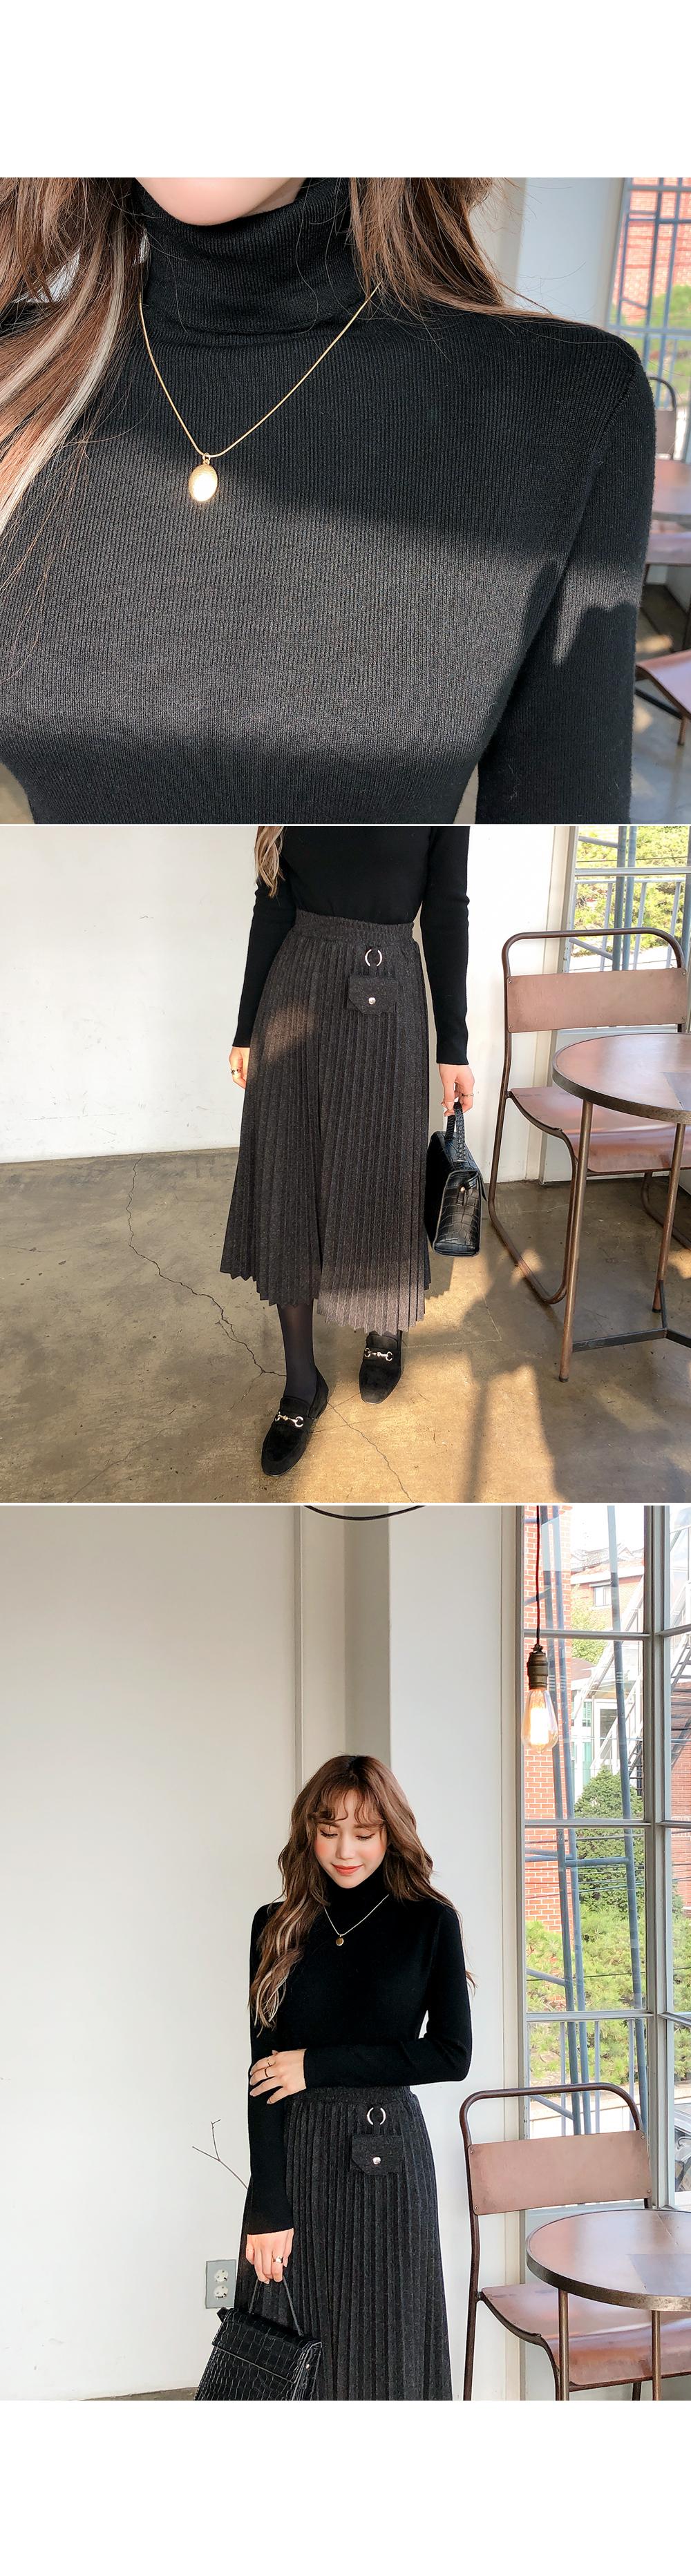 Pleated charm skirt